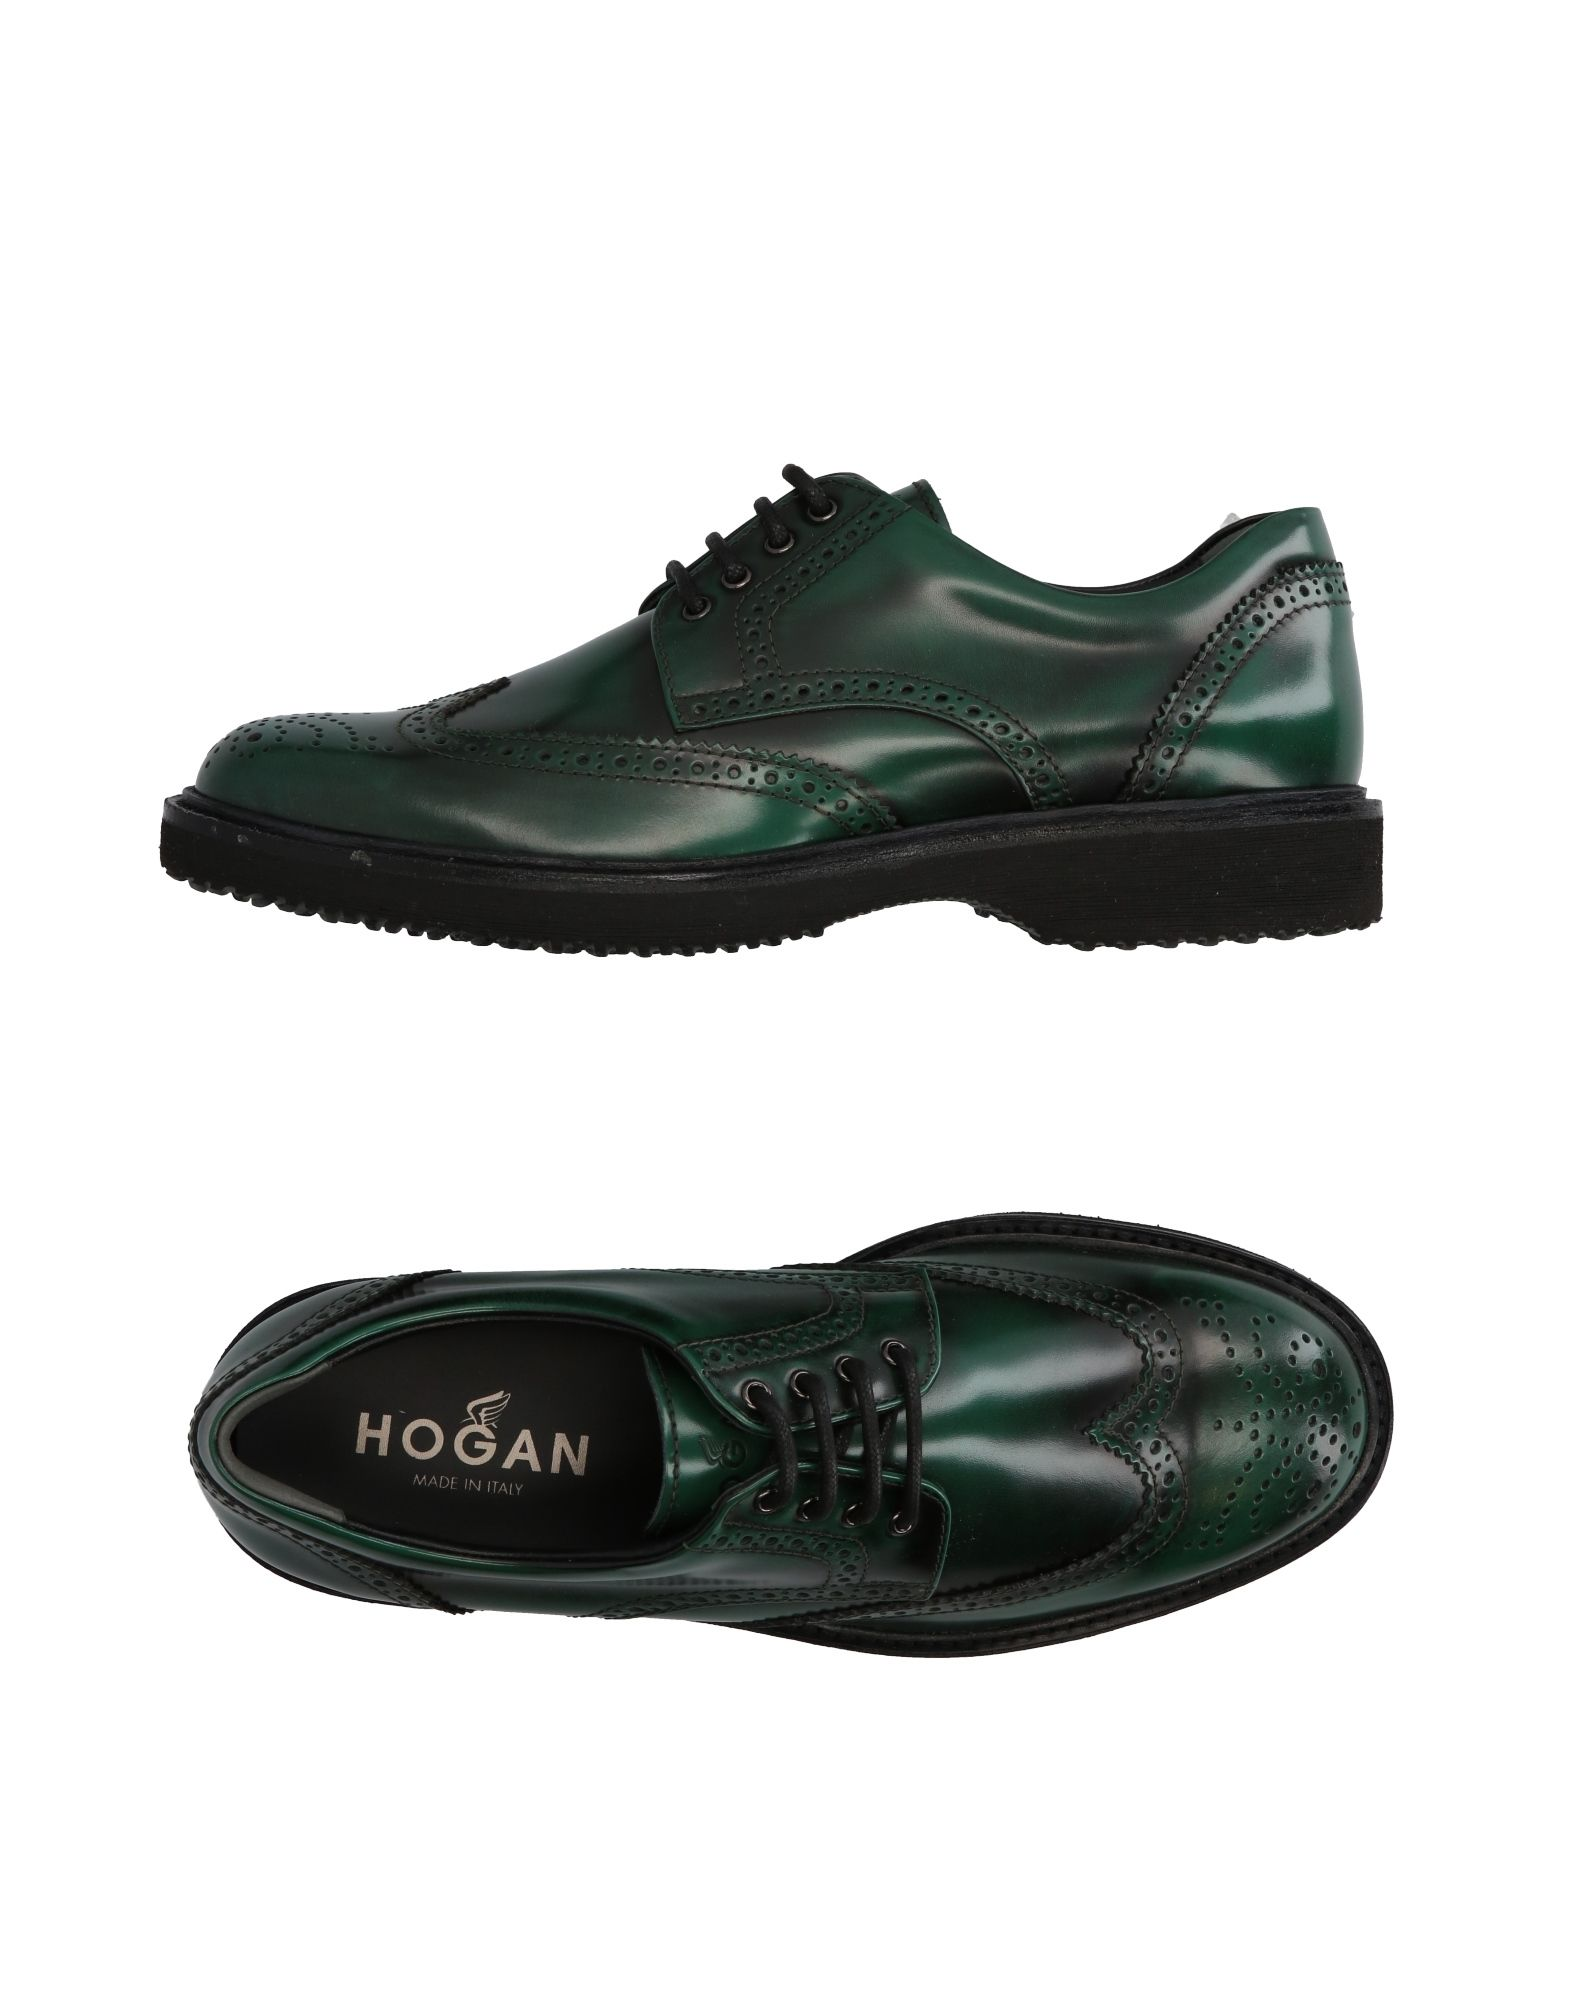 Hogan Schnürschuhe Herren  11298437KC Gute Qualität beliebte Schuhe